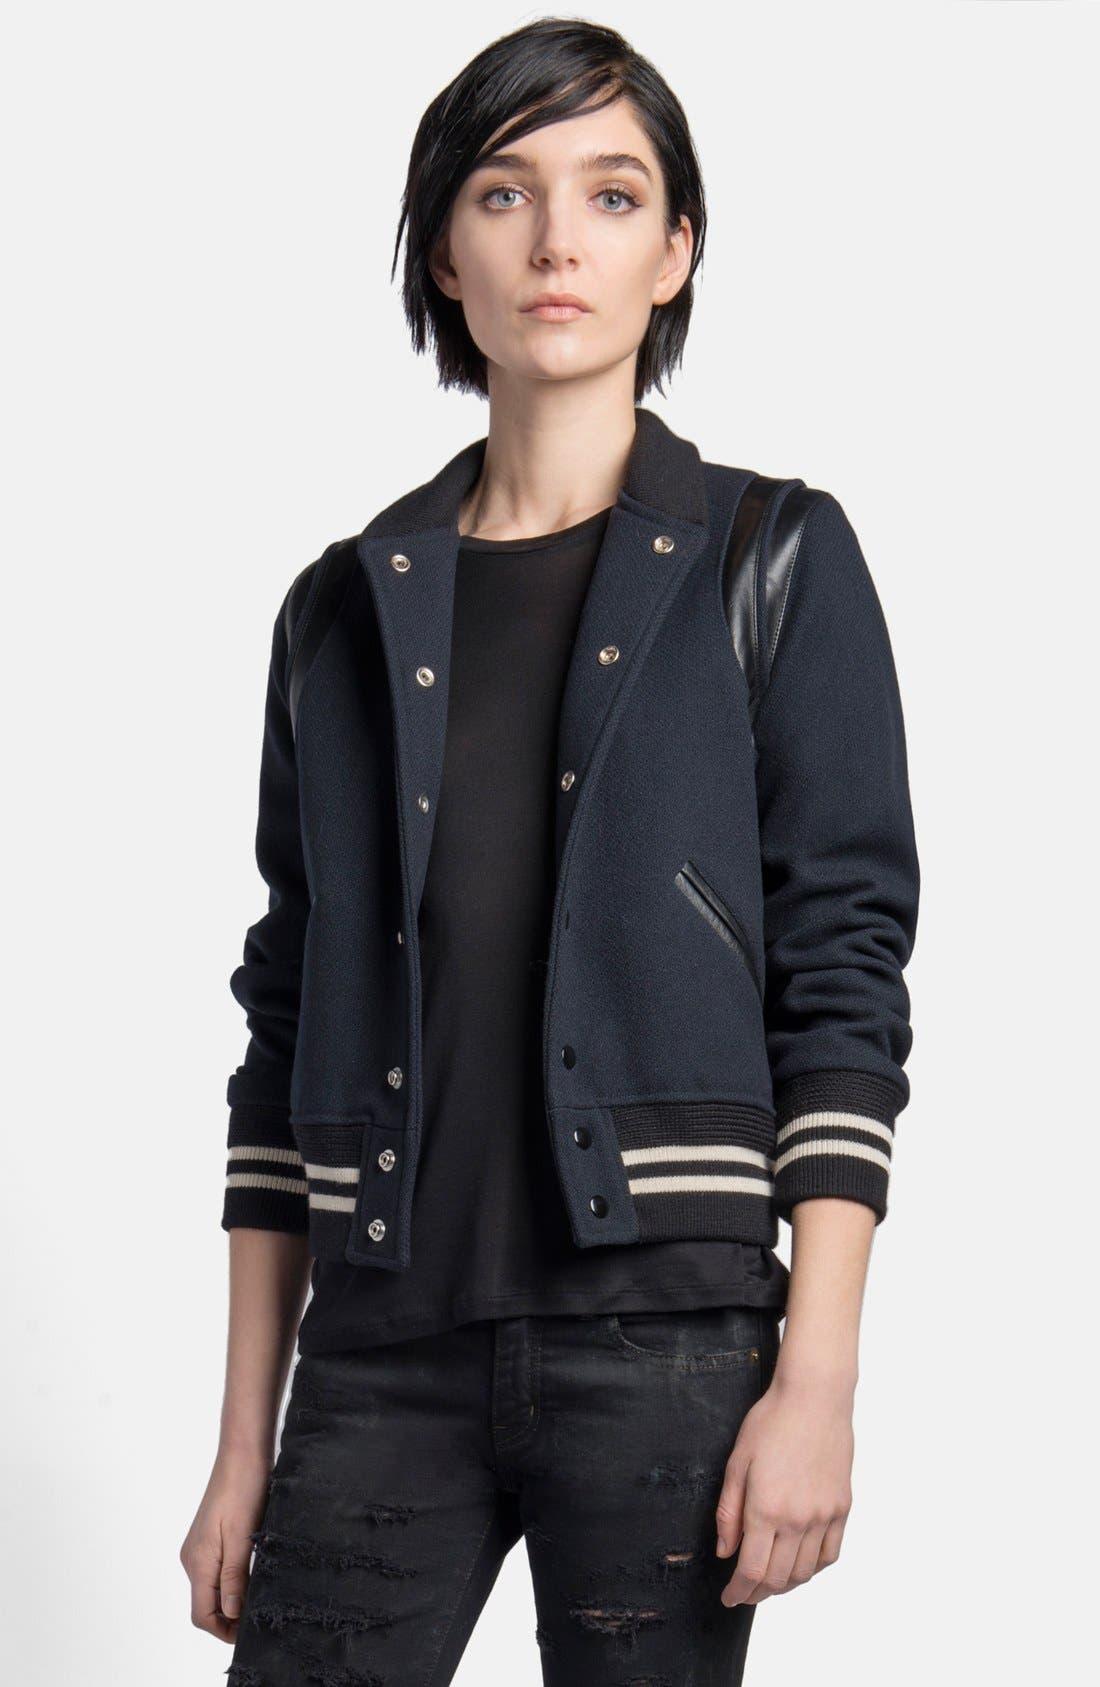 Alternate Image 1 Selected - Saint Laurent 'Teddy' Leather Trim Bomber Jacket